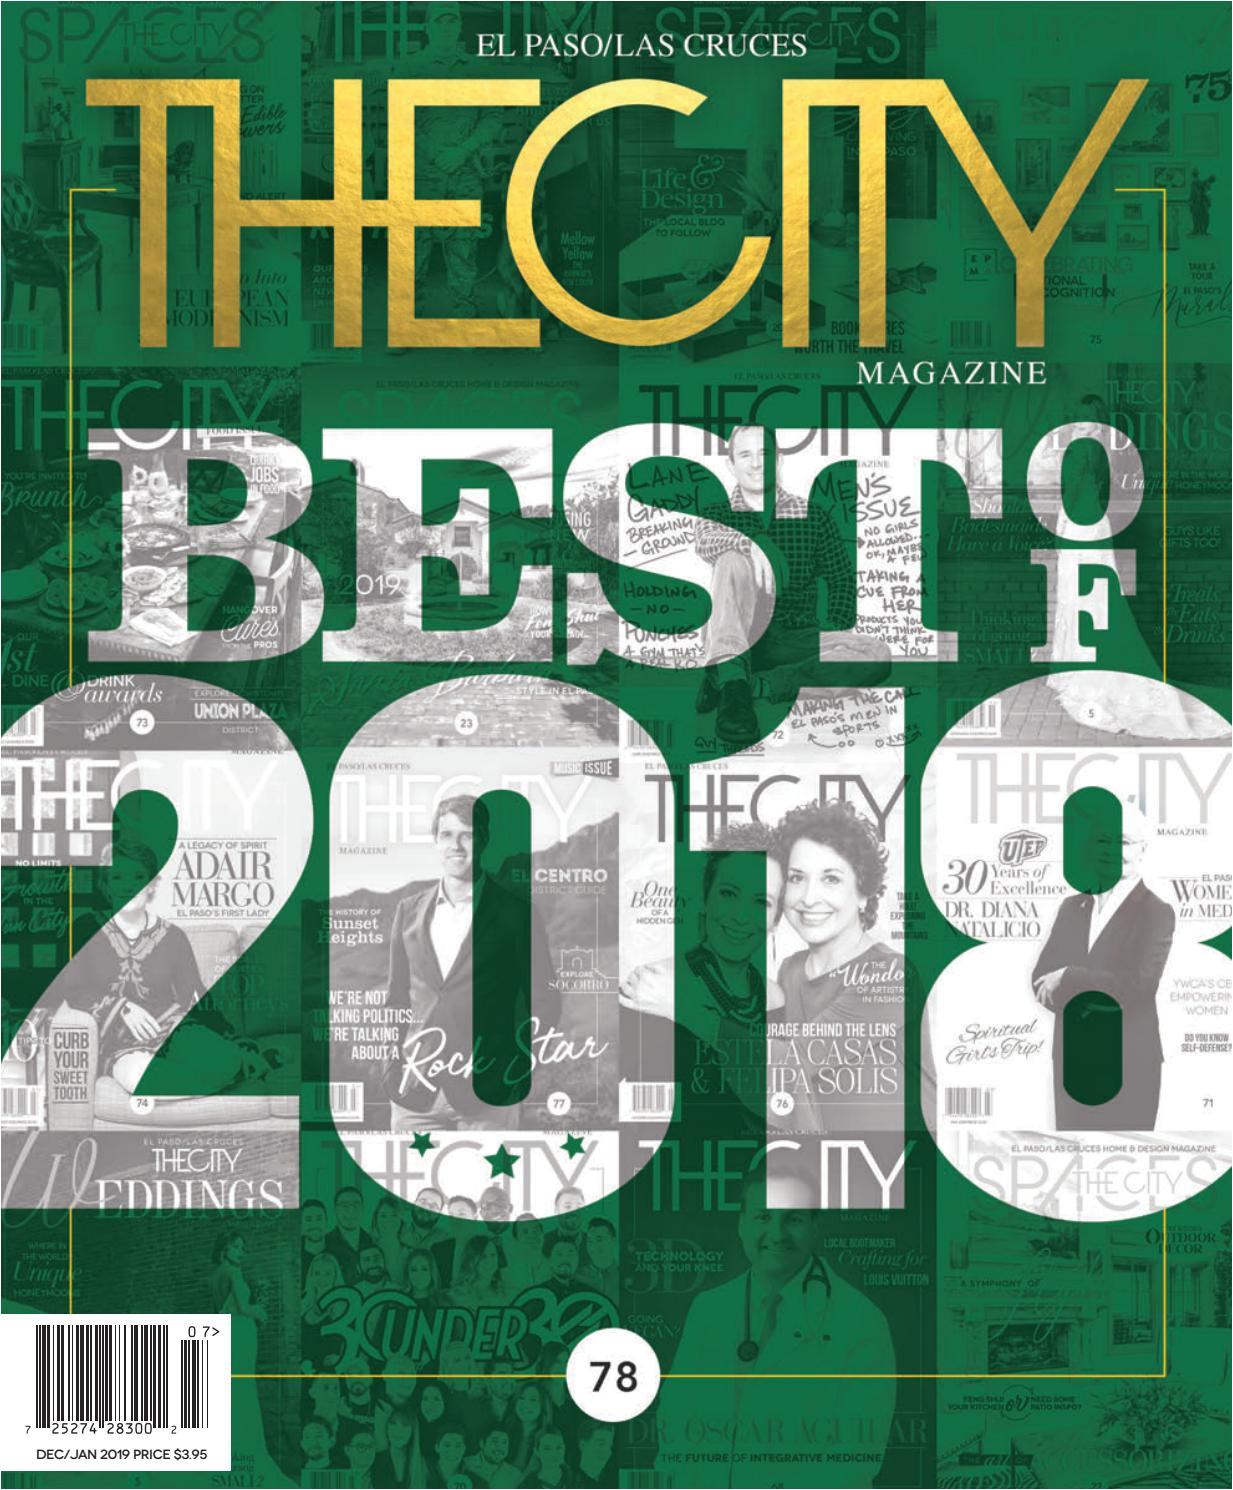 the city magazine el paso december 2018 january 2019 by thecity magazine el paso las cruces issuu